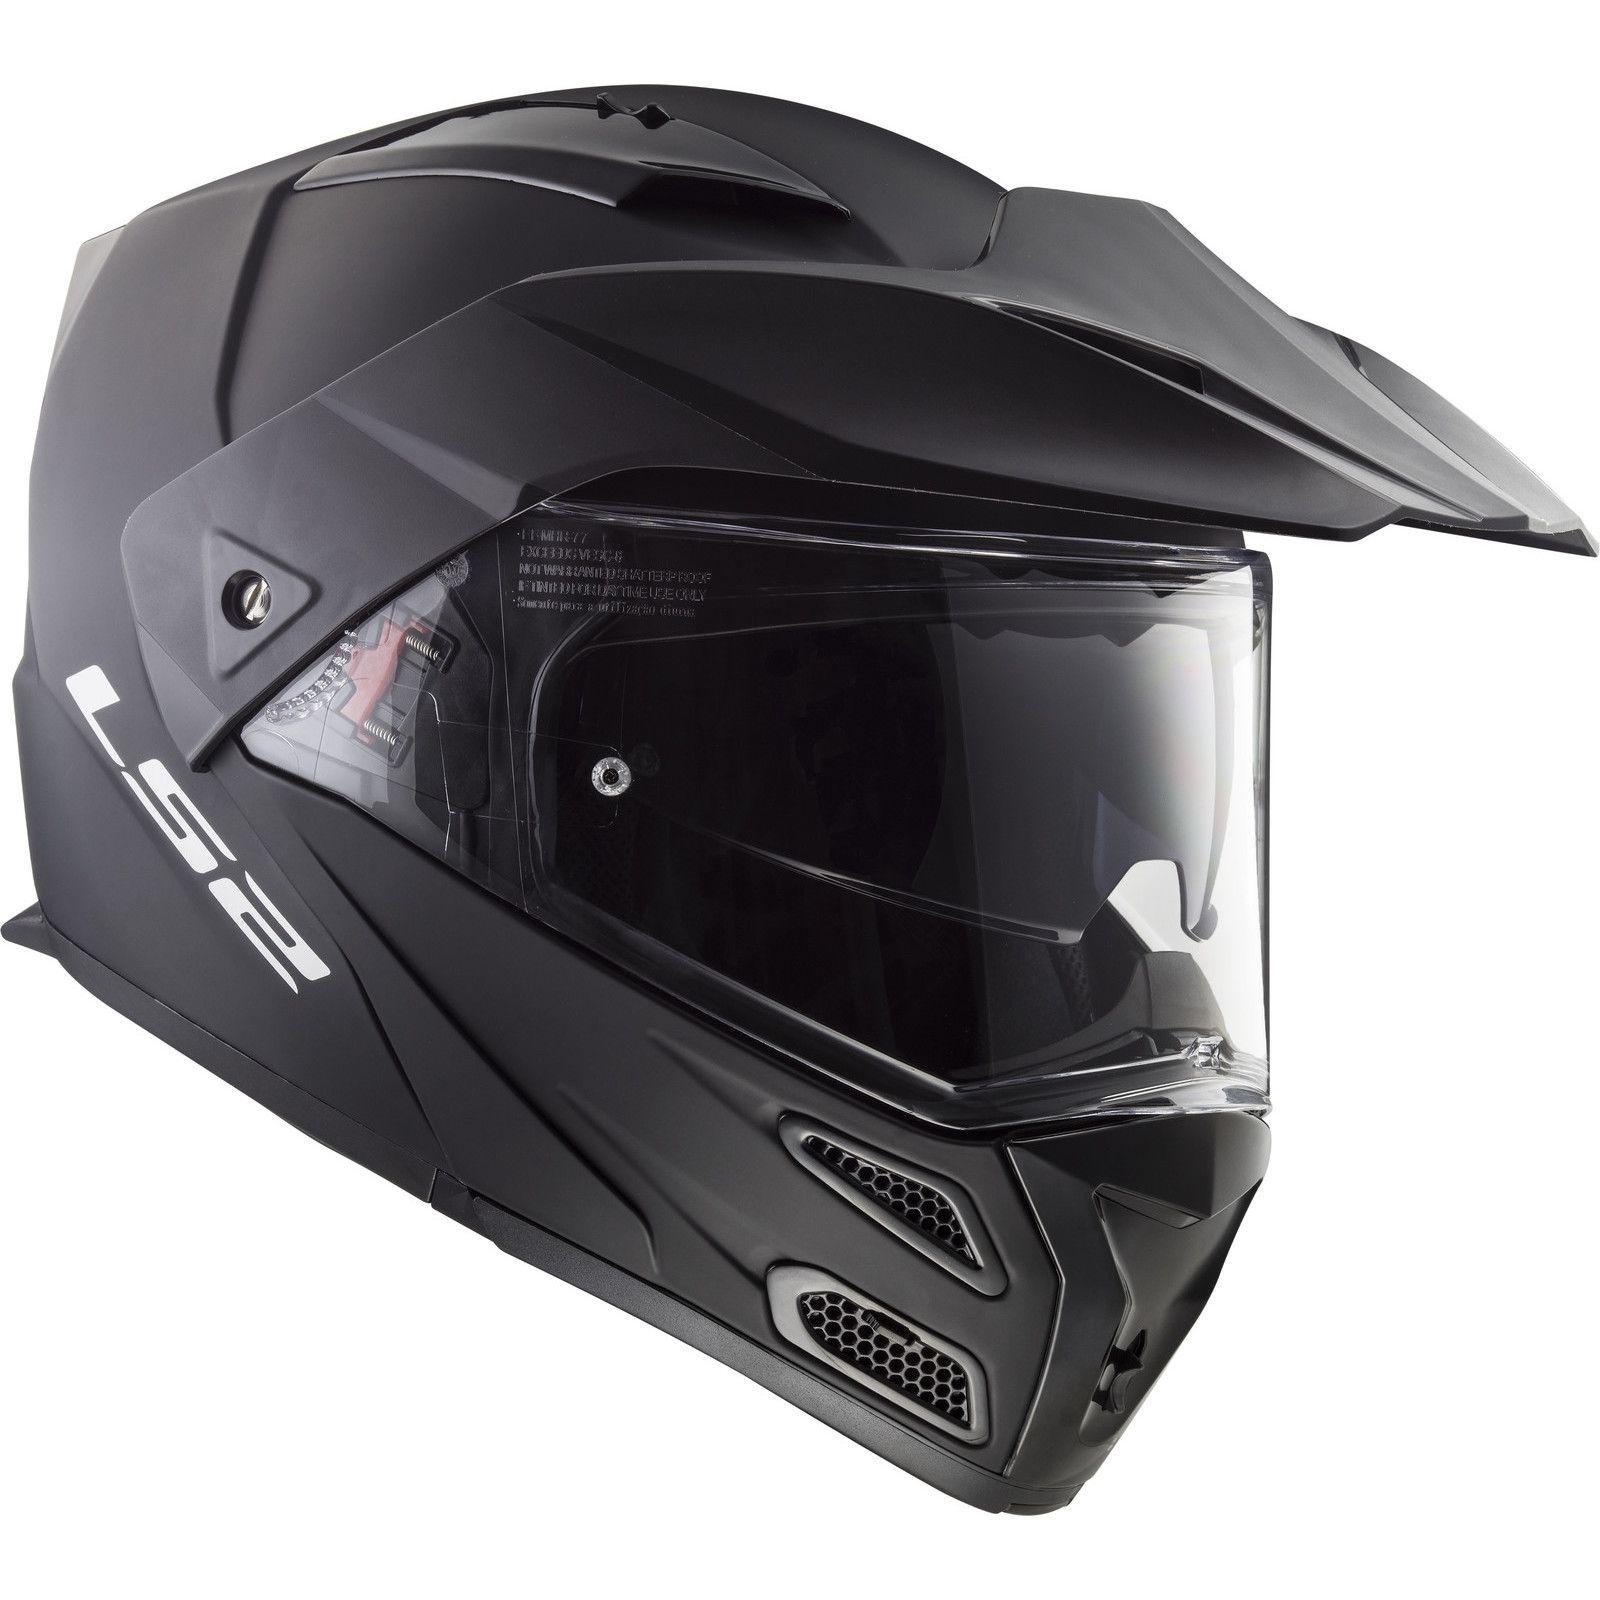 Capacete LS2  Metro FF324 Matt Black  - Nova Centro Boutique Roupas para Motociclistas